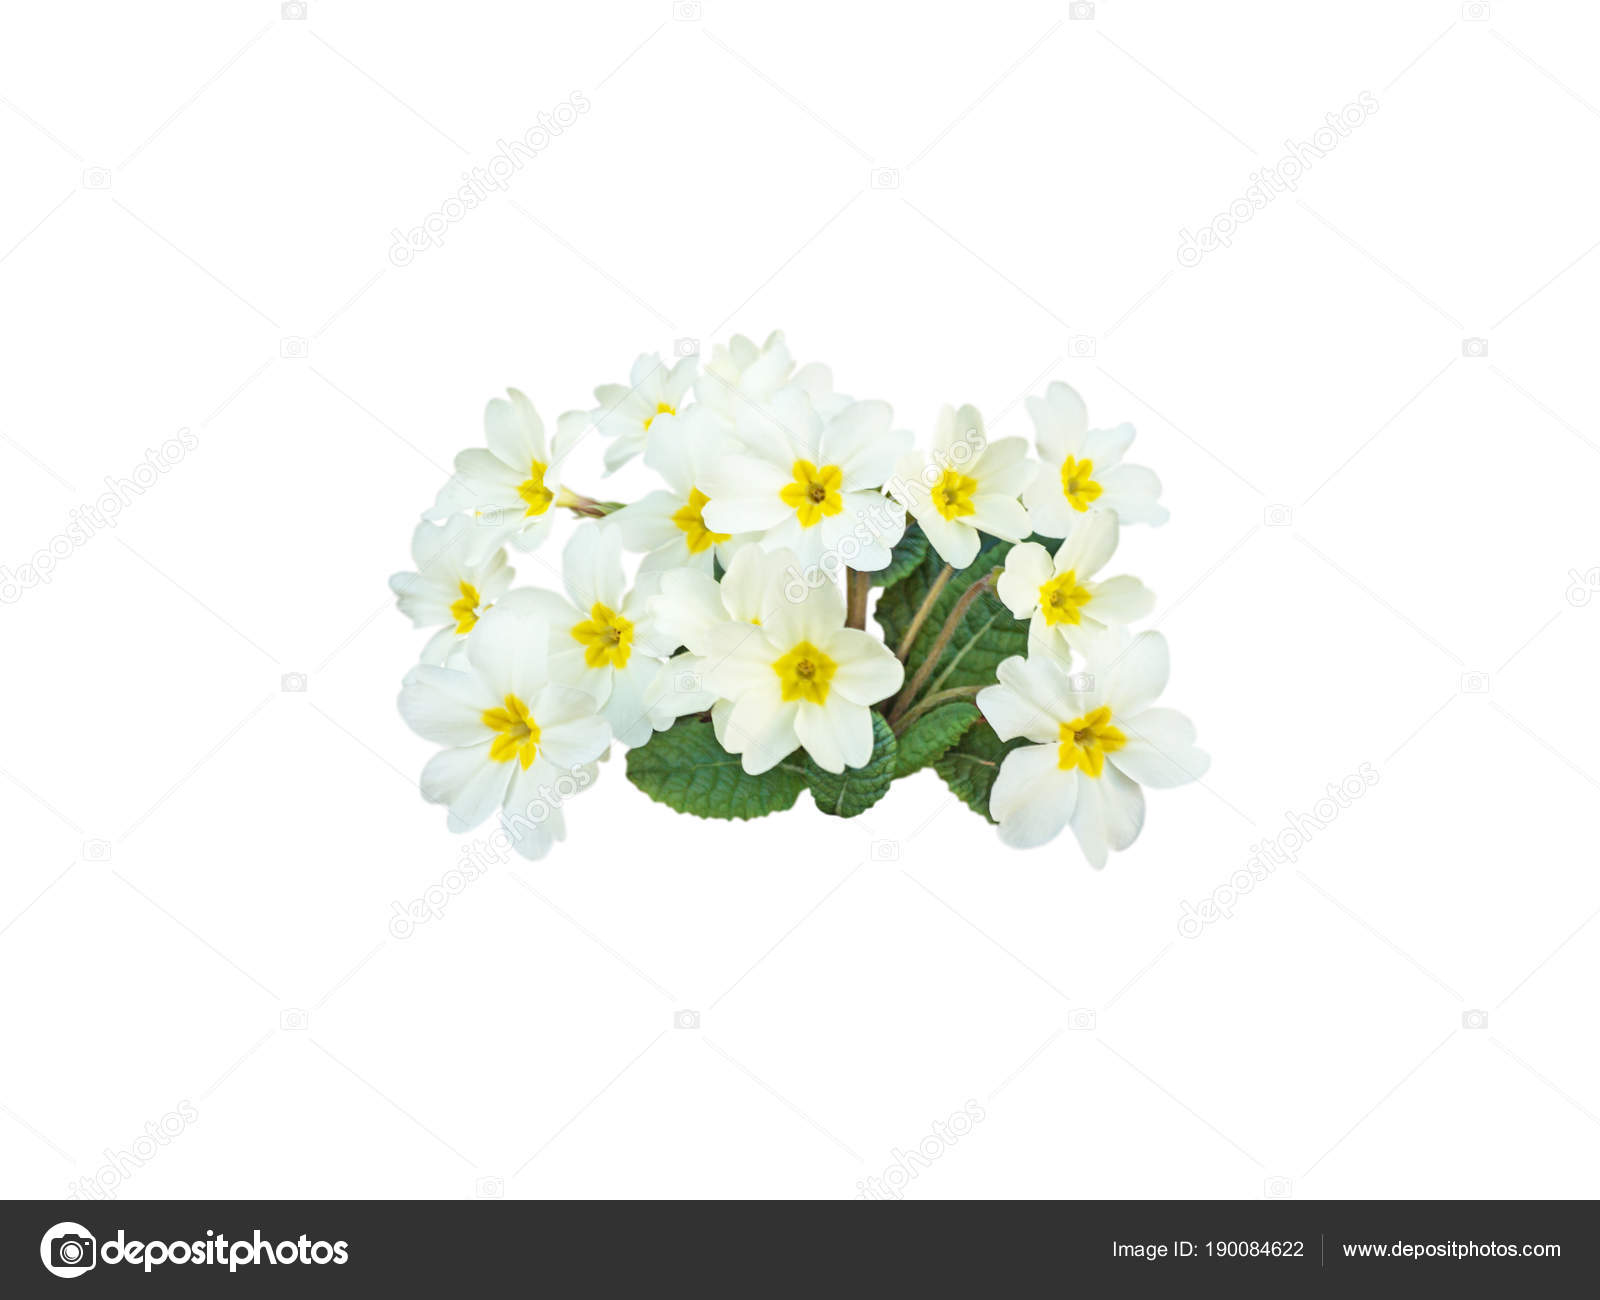 Primrose pale yellow flowers stock photo photohampster 190084622 primrose pale yellow flowers stock photo mightylinksfo